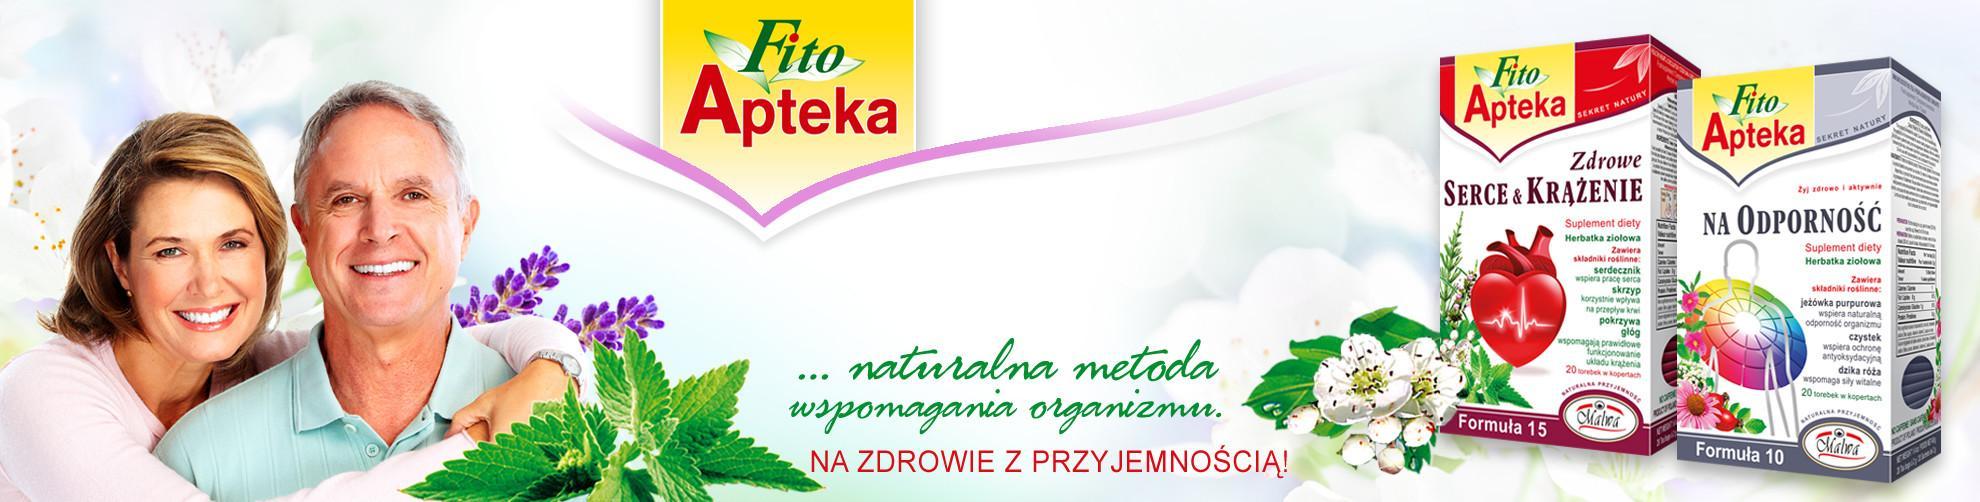 Malwa Tea - Herbaty Funkcjonalne